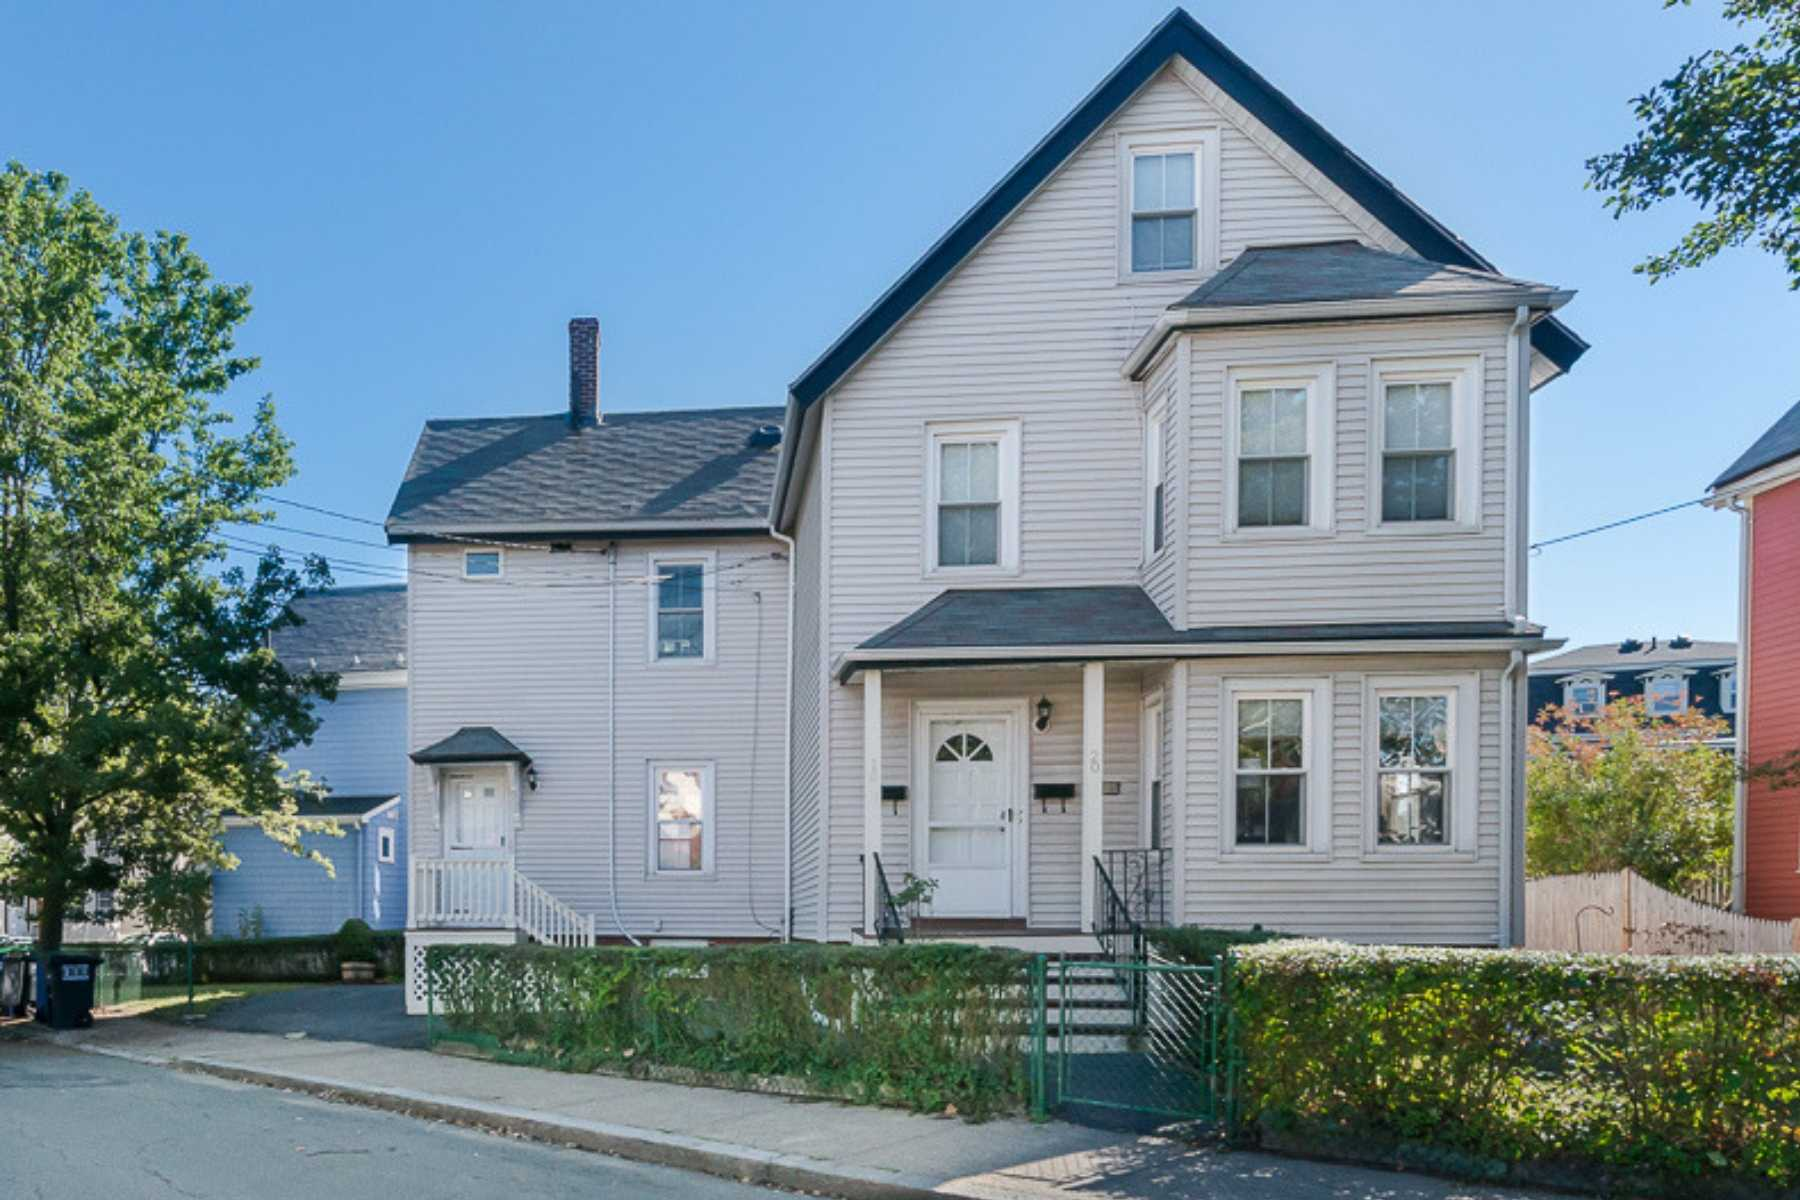 1-CapstoneCommunities-property-Dickinson-Street-Apartments-Somerville.jpg